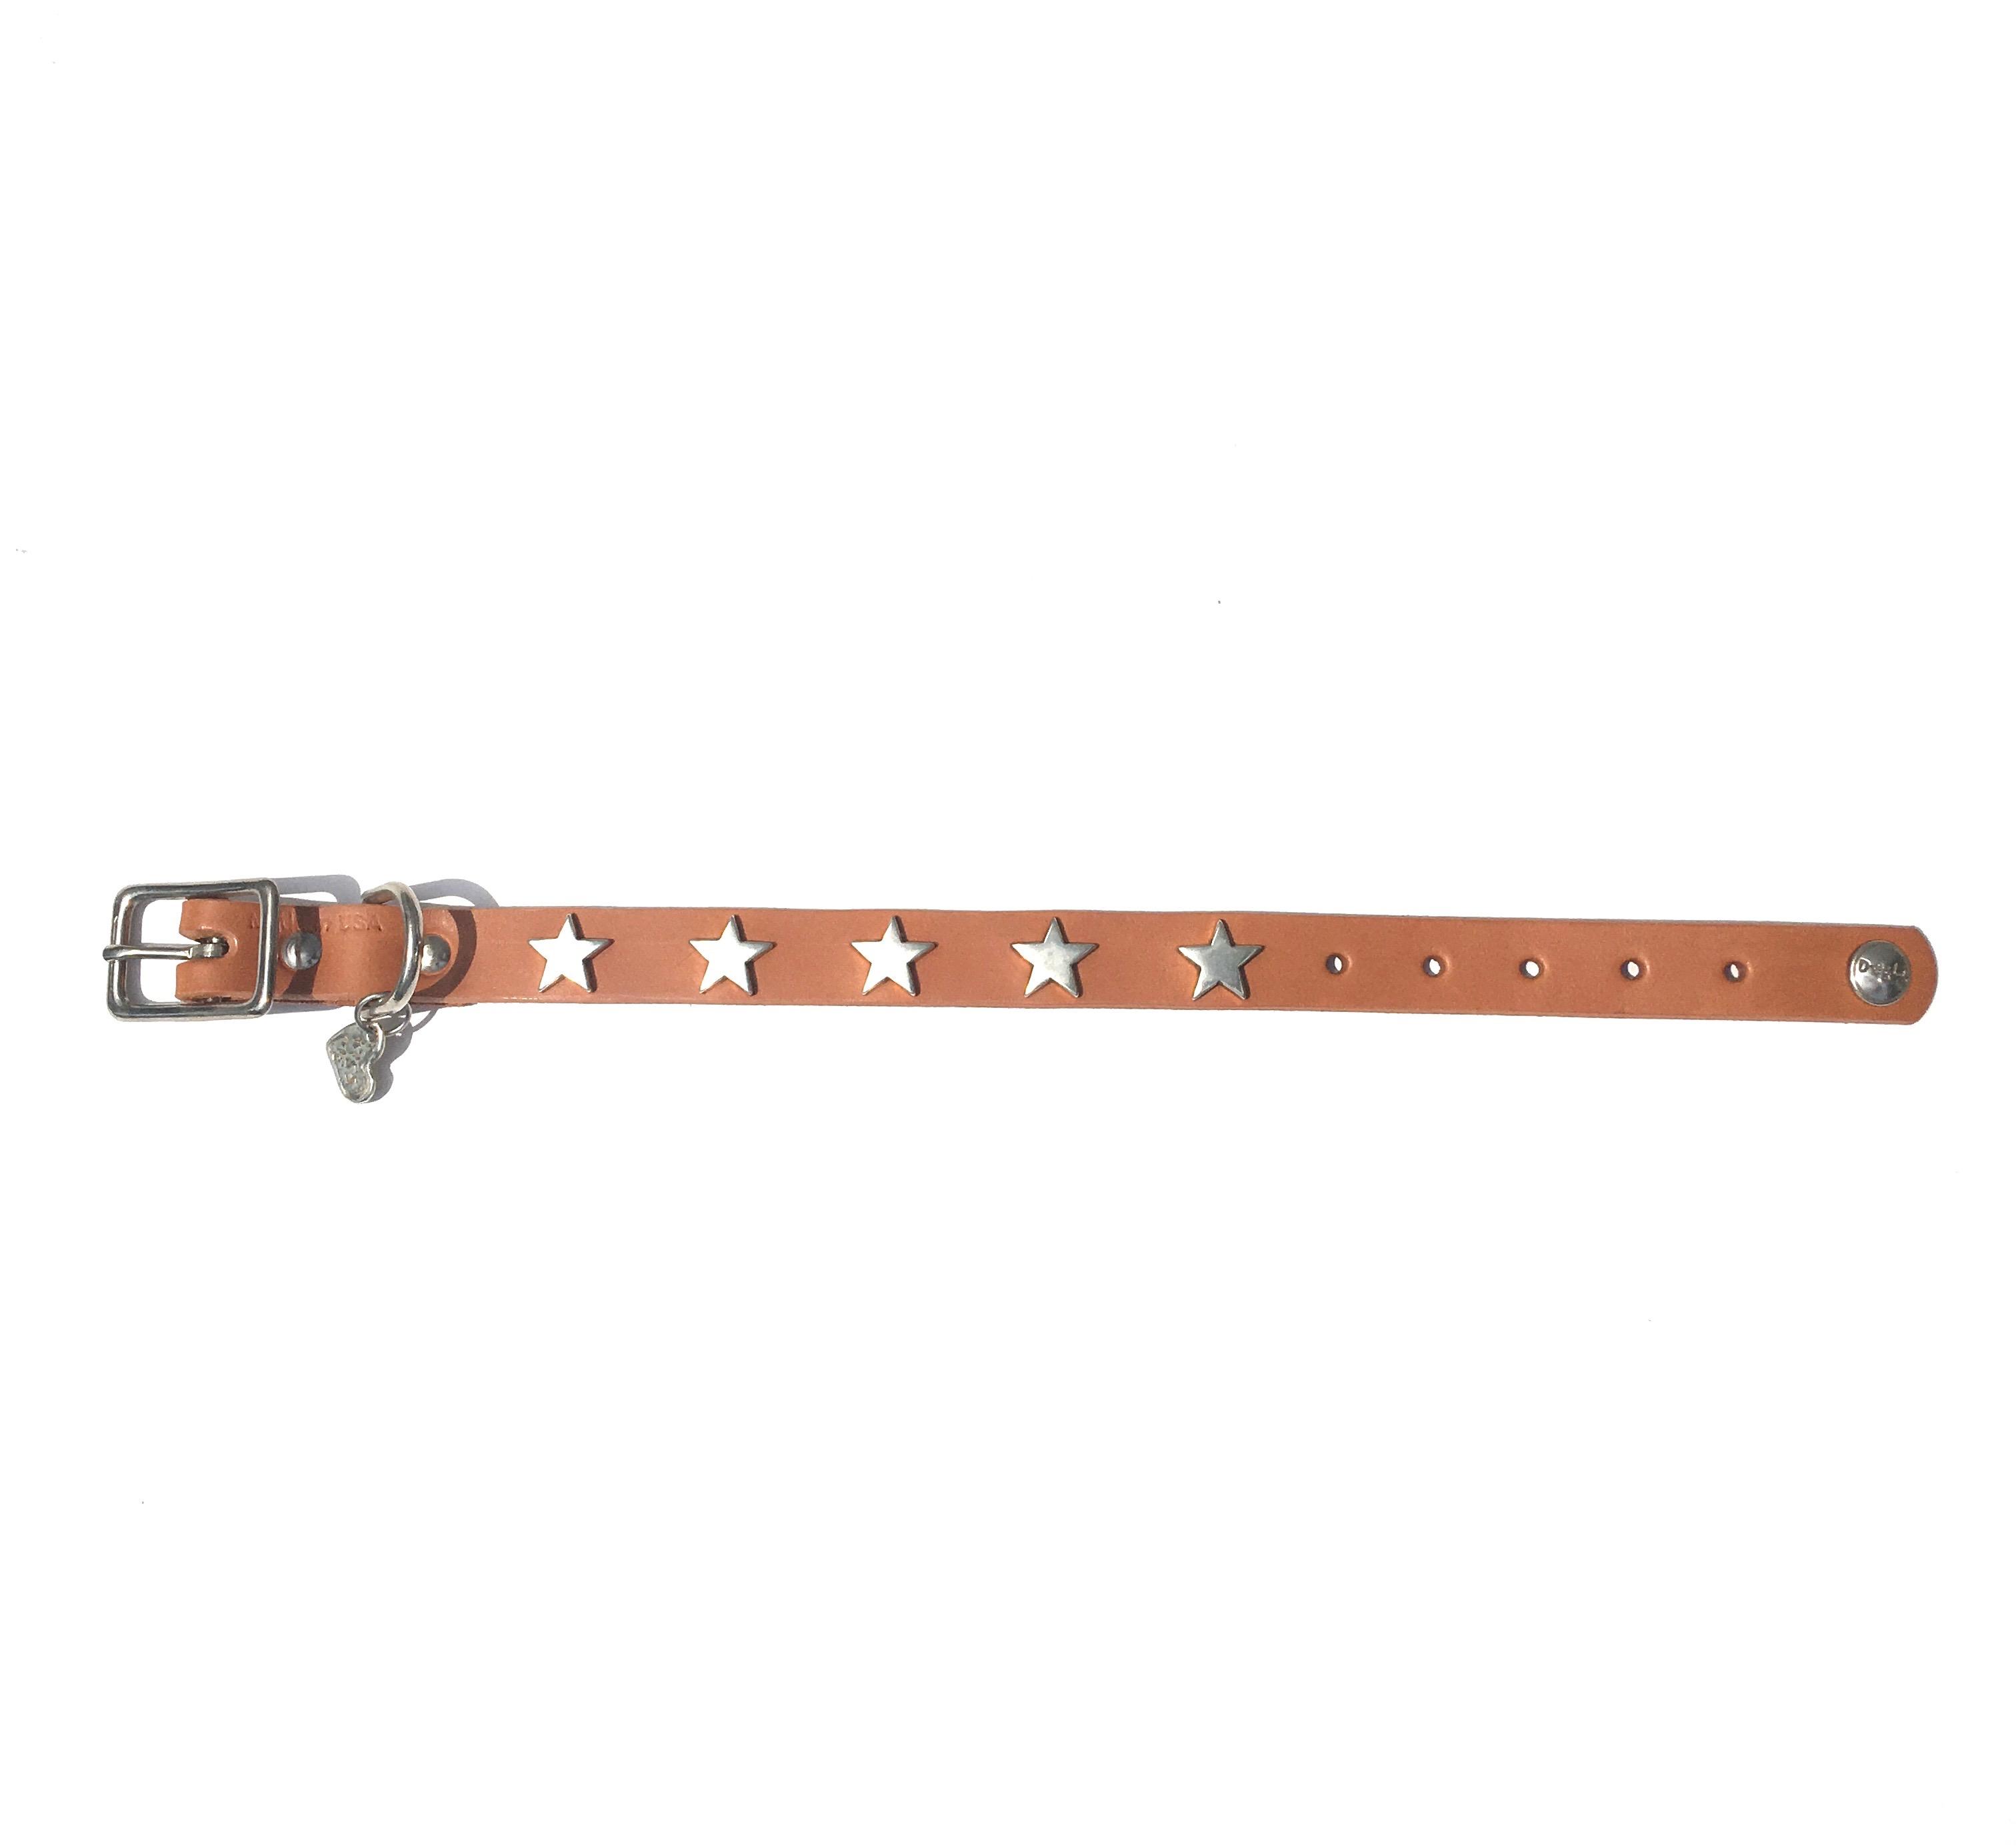 Dog La Star COLLAR ドグラ スター カラー 3/4インチ(2cm幅) 別注10インチ_d0217958_11223174.jpg